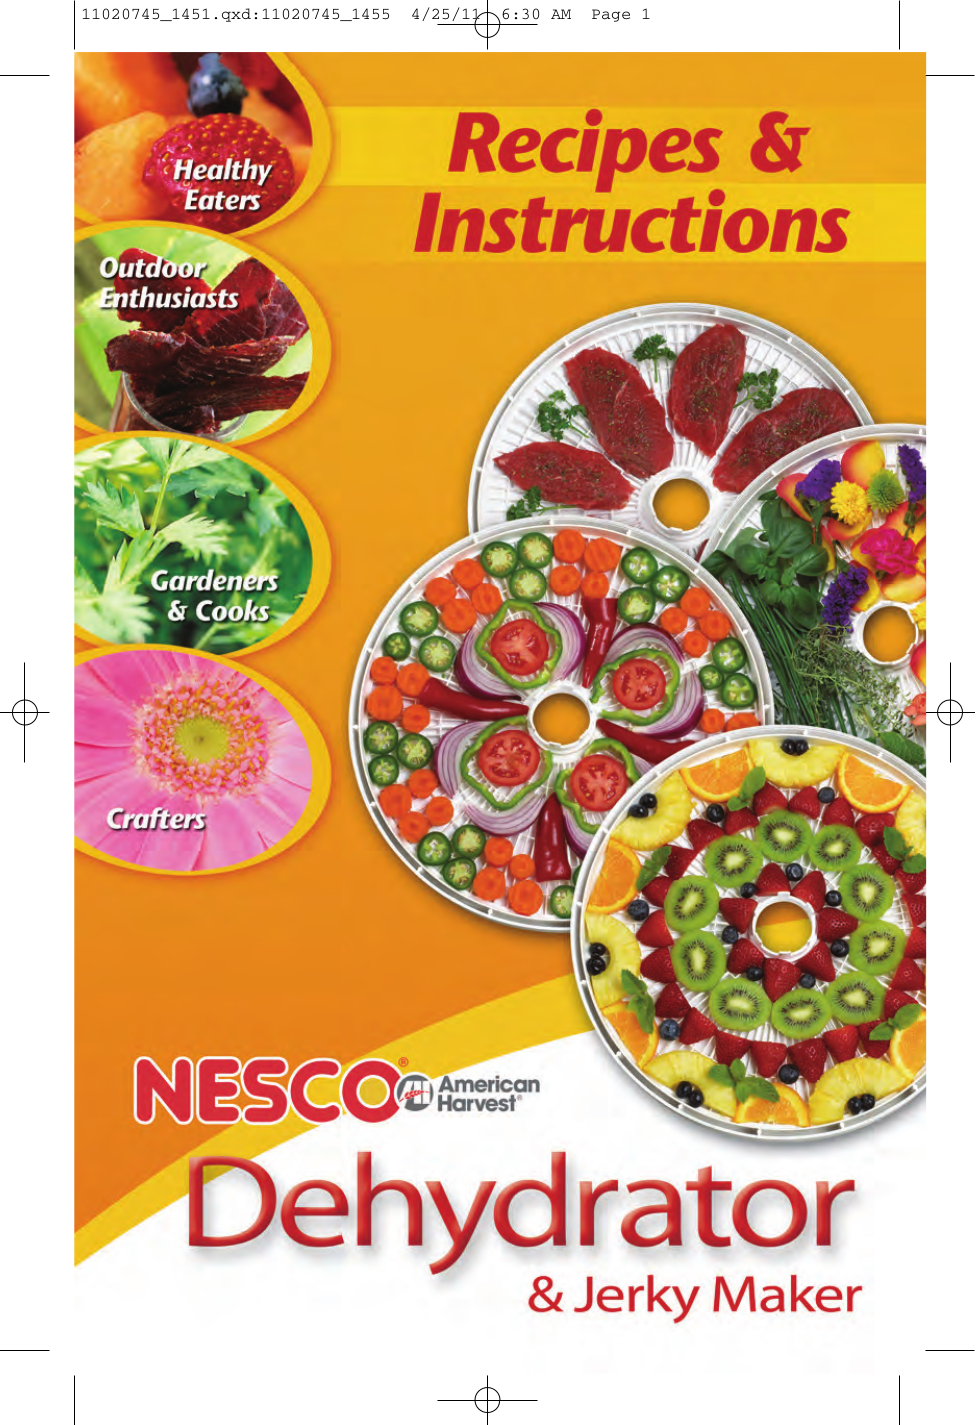 Download free pdf for nesco fd 50 food dehydrator other manual pdf for nesco other fd 50 food dehydrator manual forumfinder Gallery